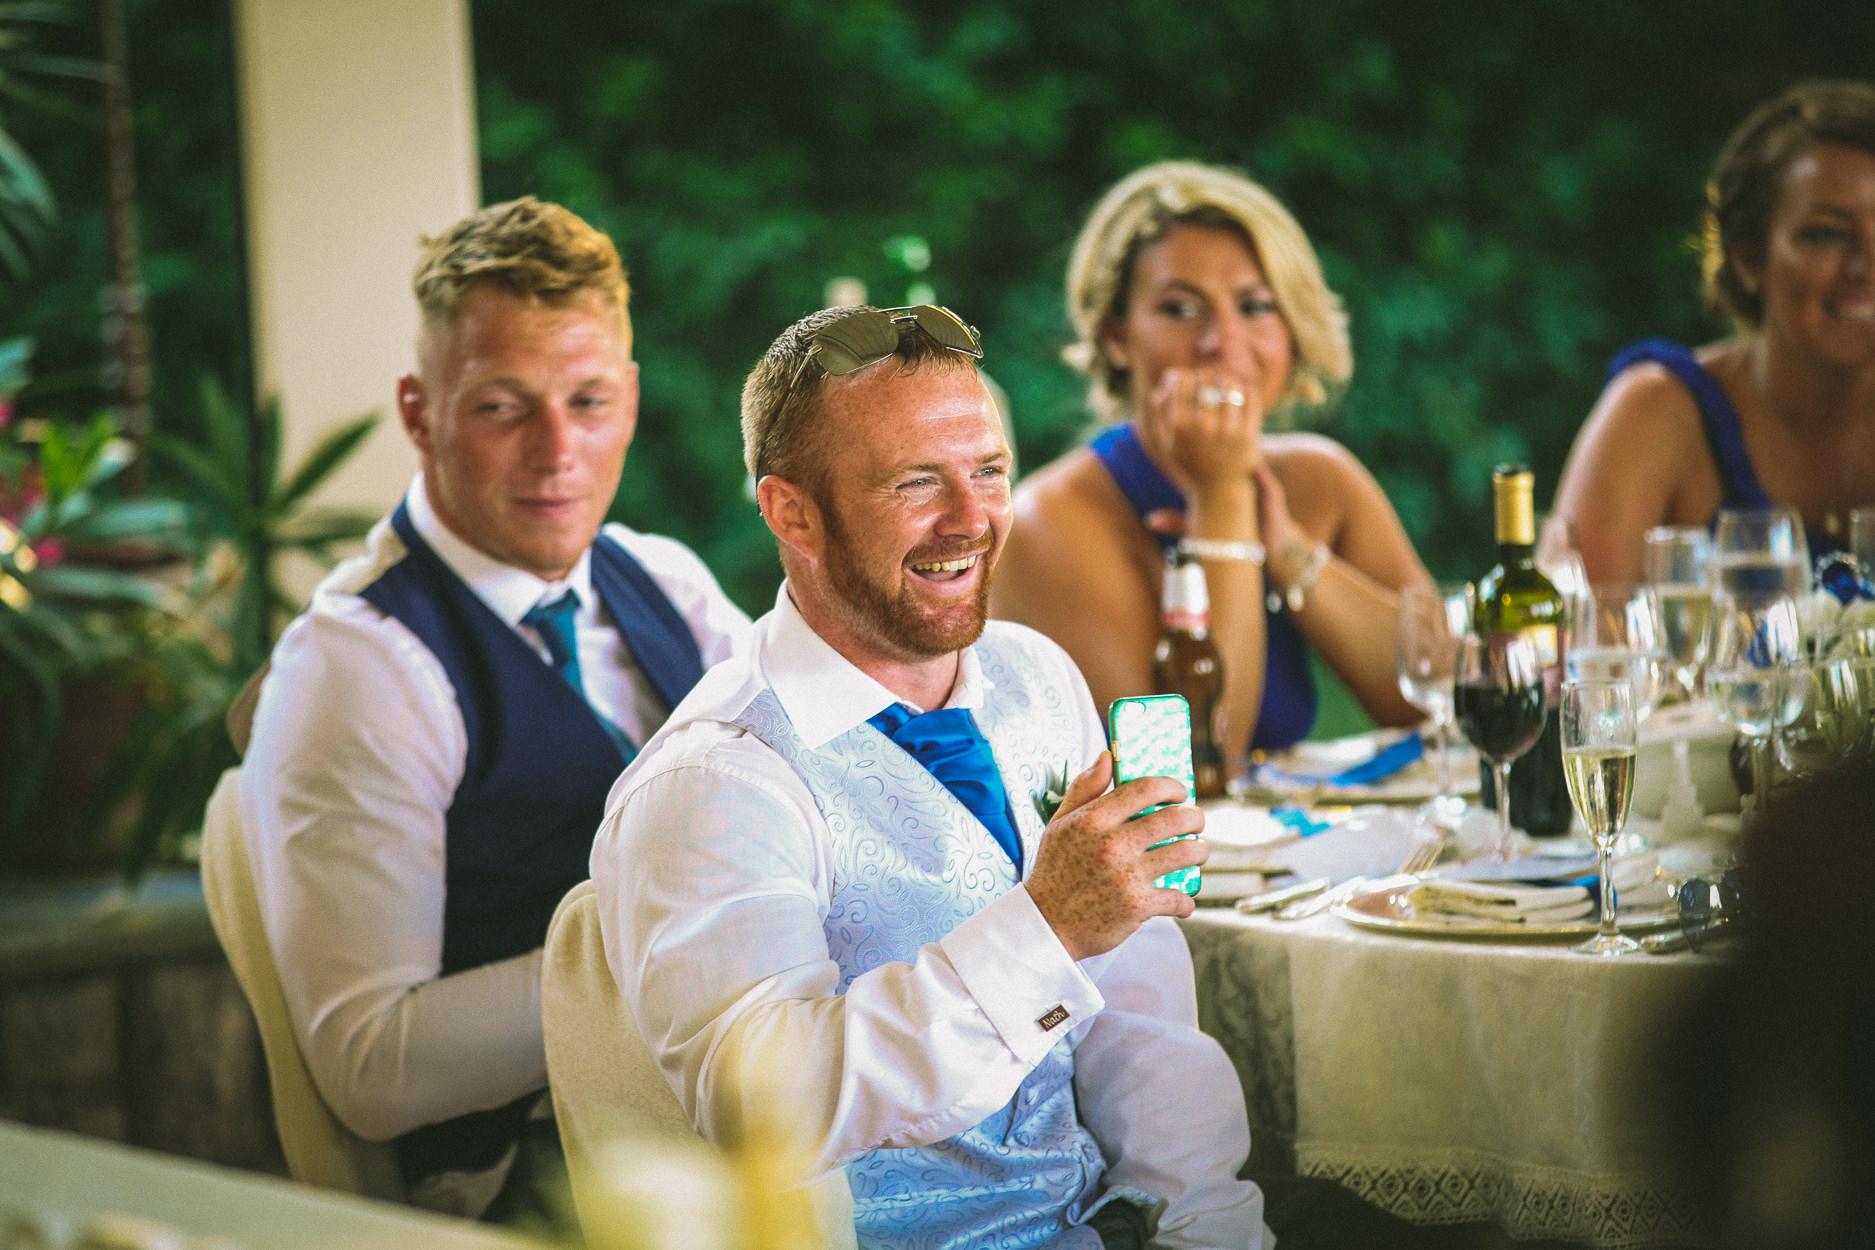 Amalfi-Coast-wedding-venue-Wedding-Photography-Villa Antiche Mura-Sorrento-Italy-20